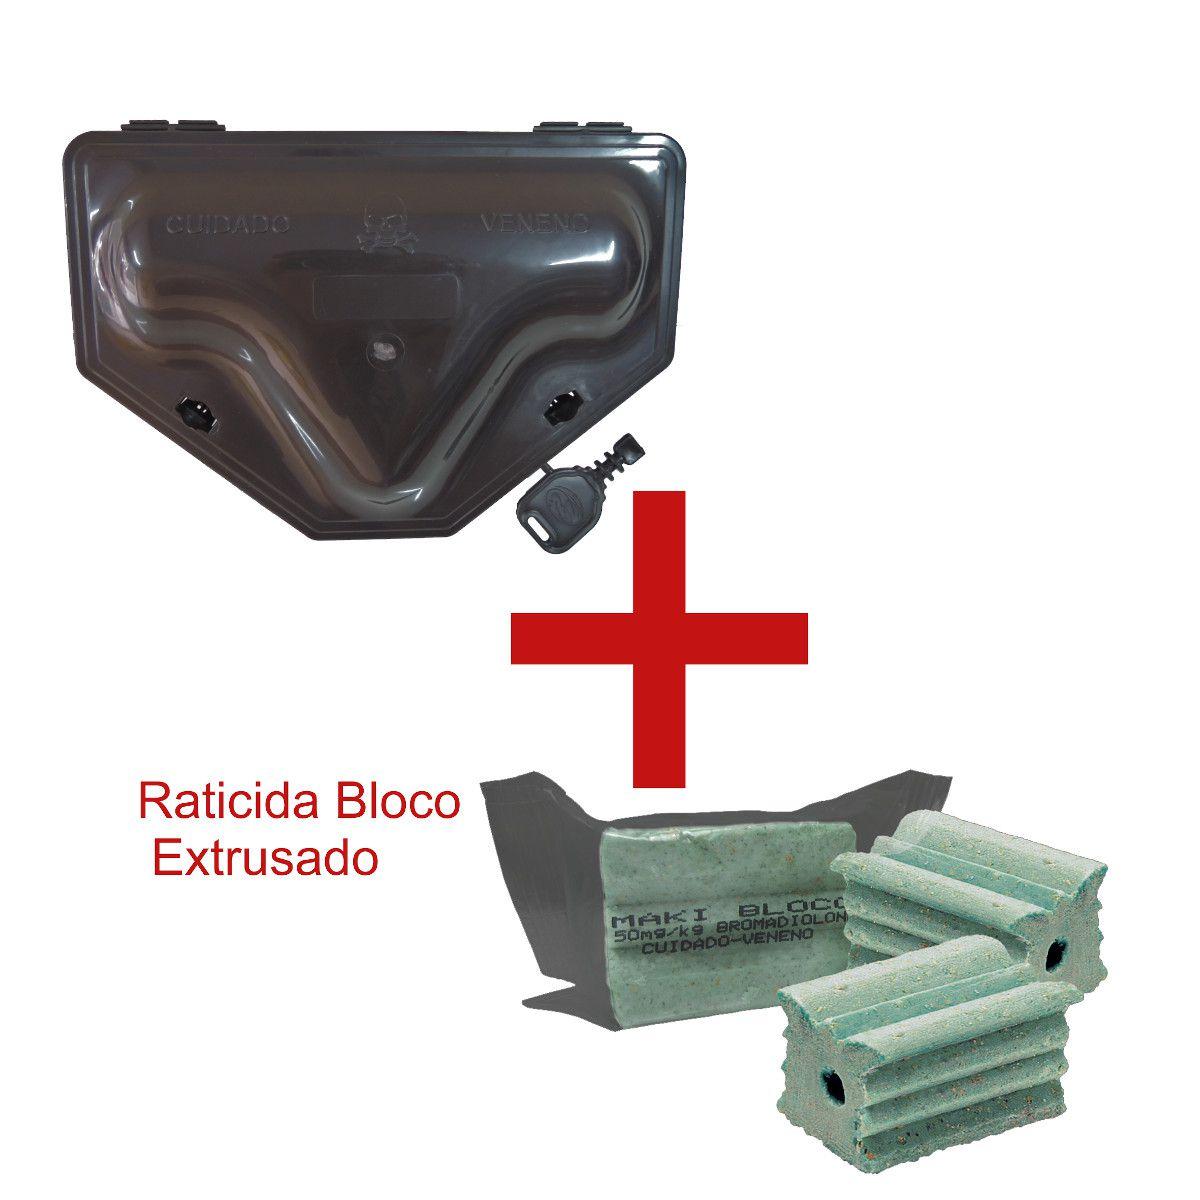 KIT 20 Porta Iscas Armadilha Pega Ratos 2 TRAVAS c/ Chave